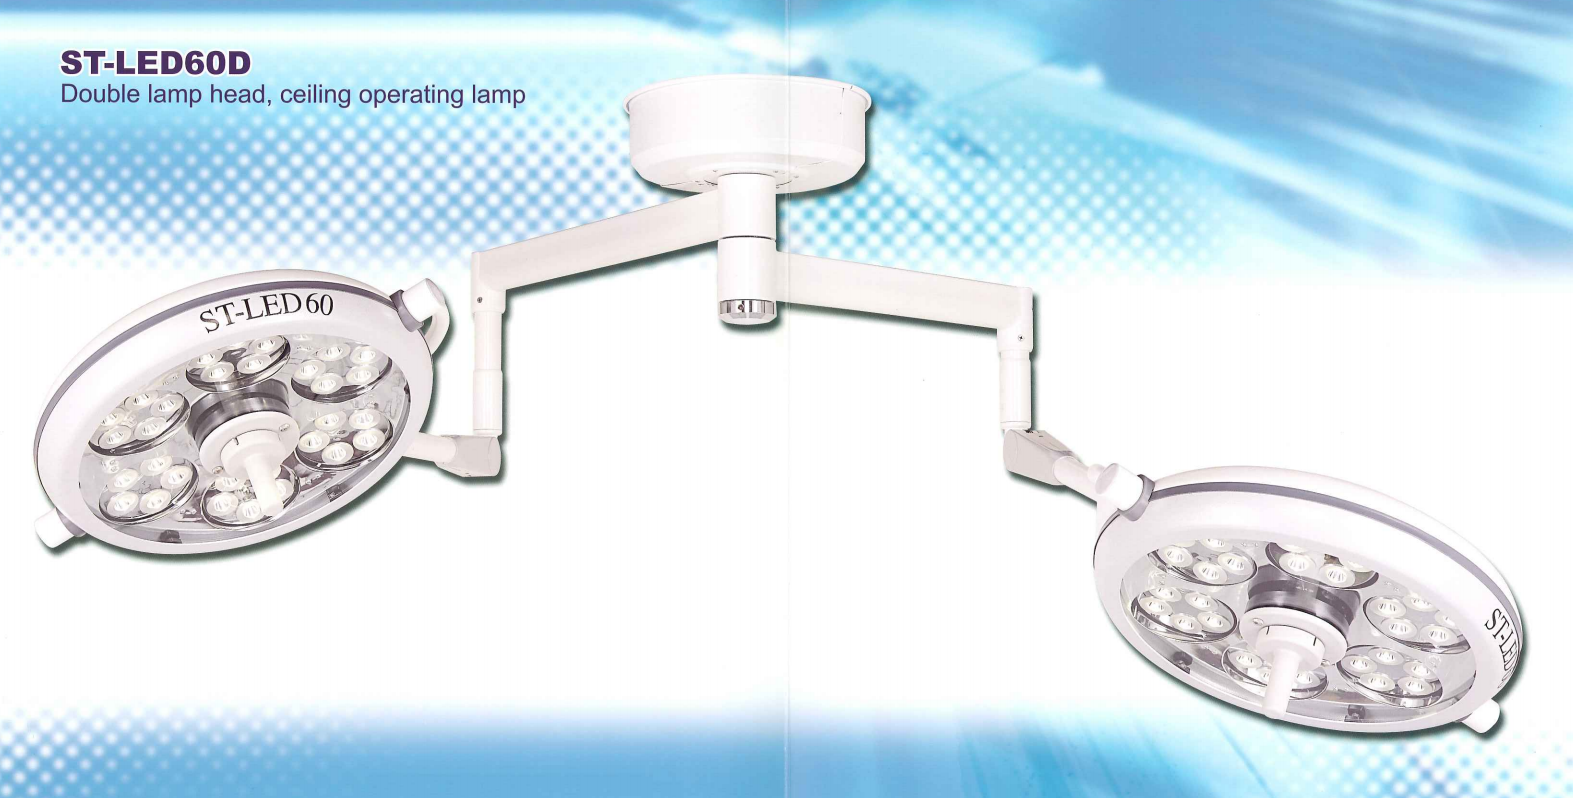 ST-LED60 LED Operating Lamps